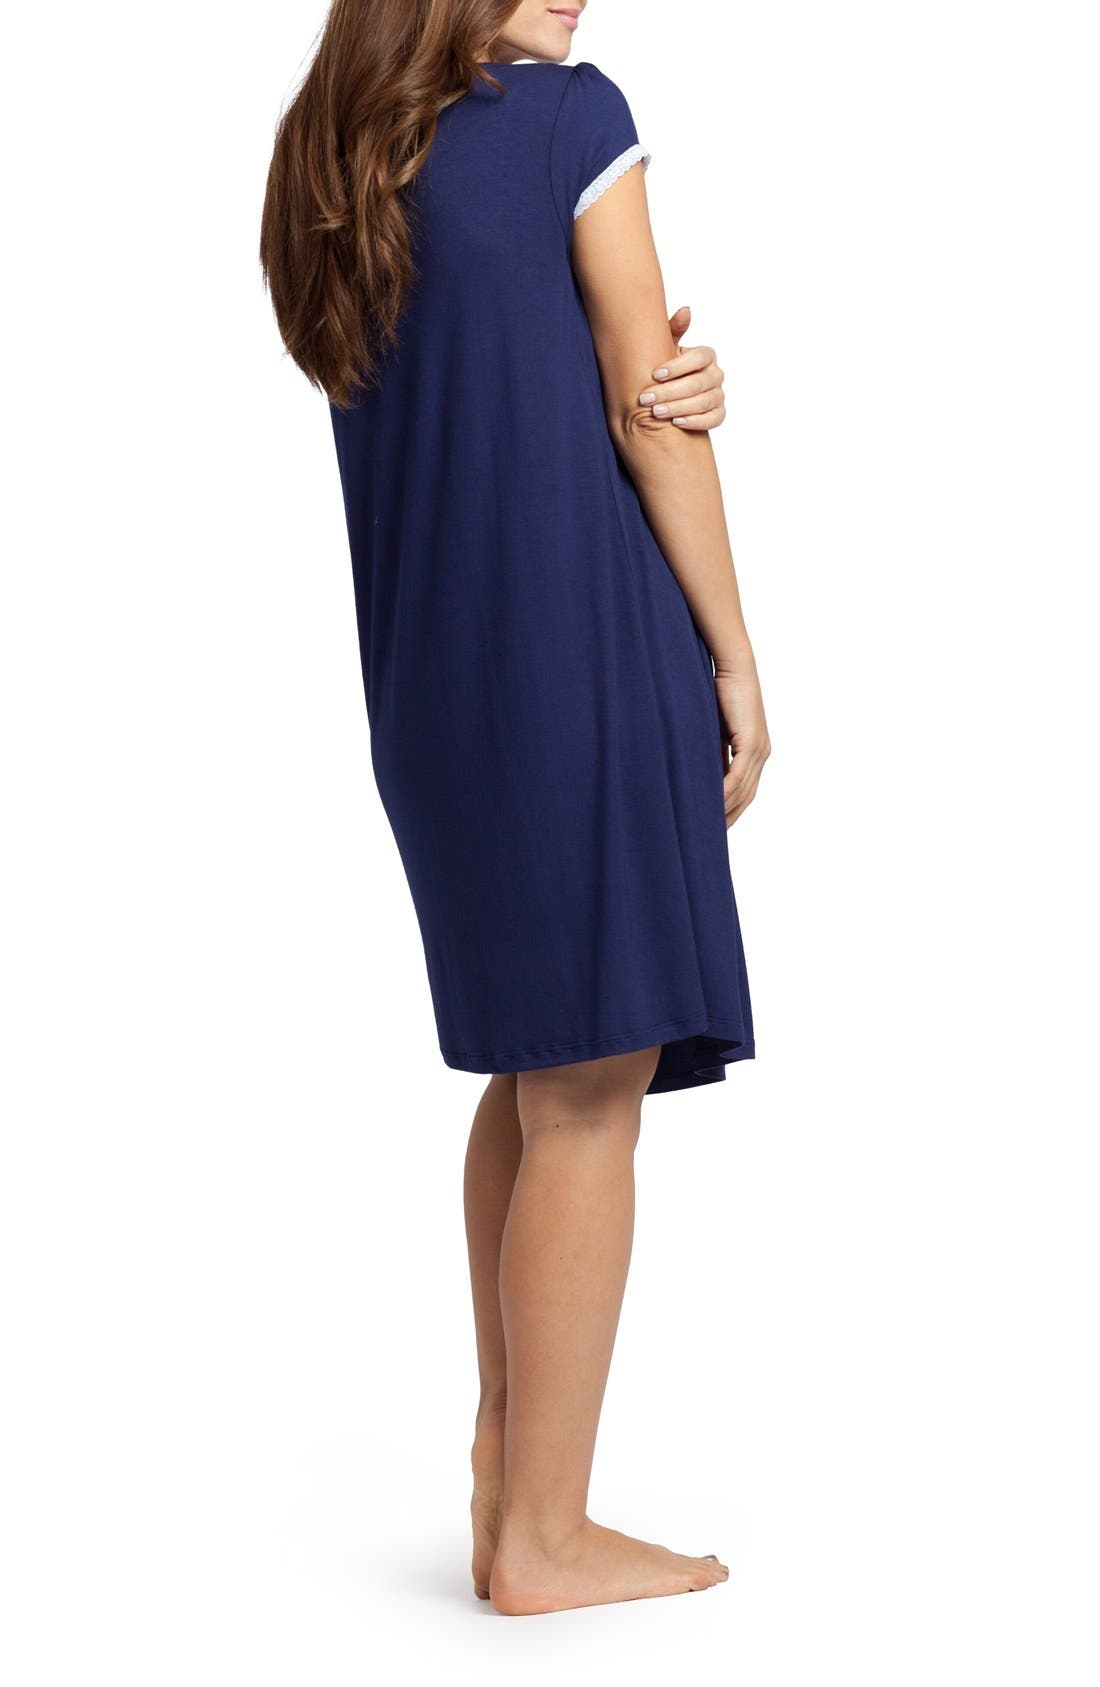 'The Lace' Maternity/Nursing Nightgown,                             Alternate thumbnail 2, color,                             Estate Blue